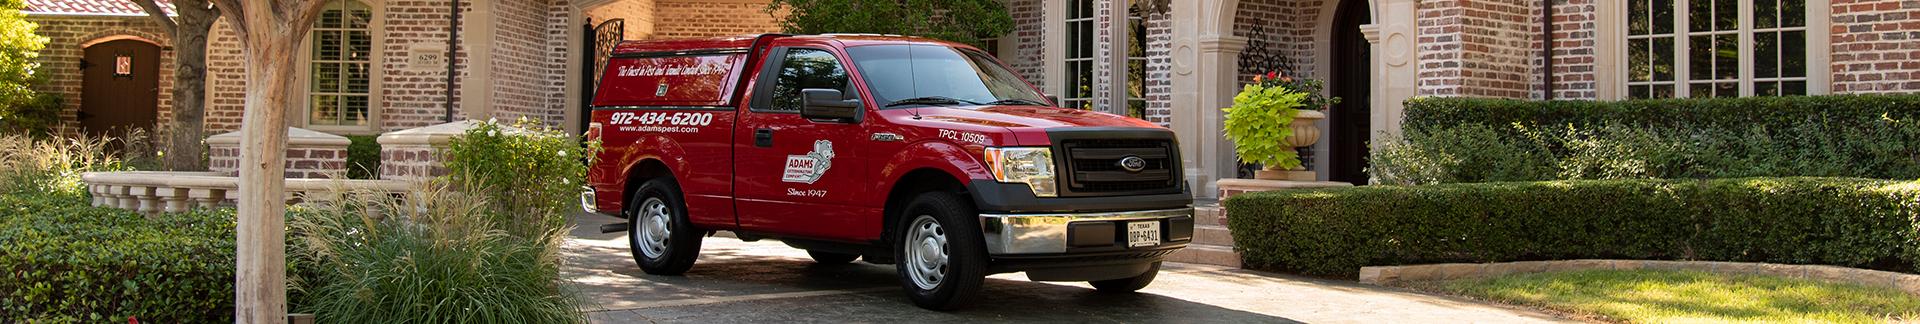 adams pest control's truck in frisco tx